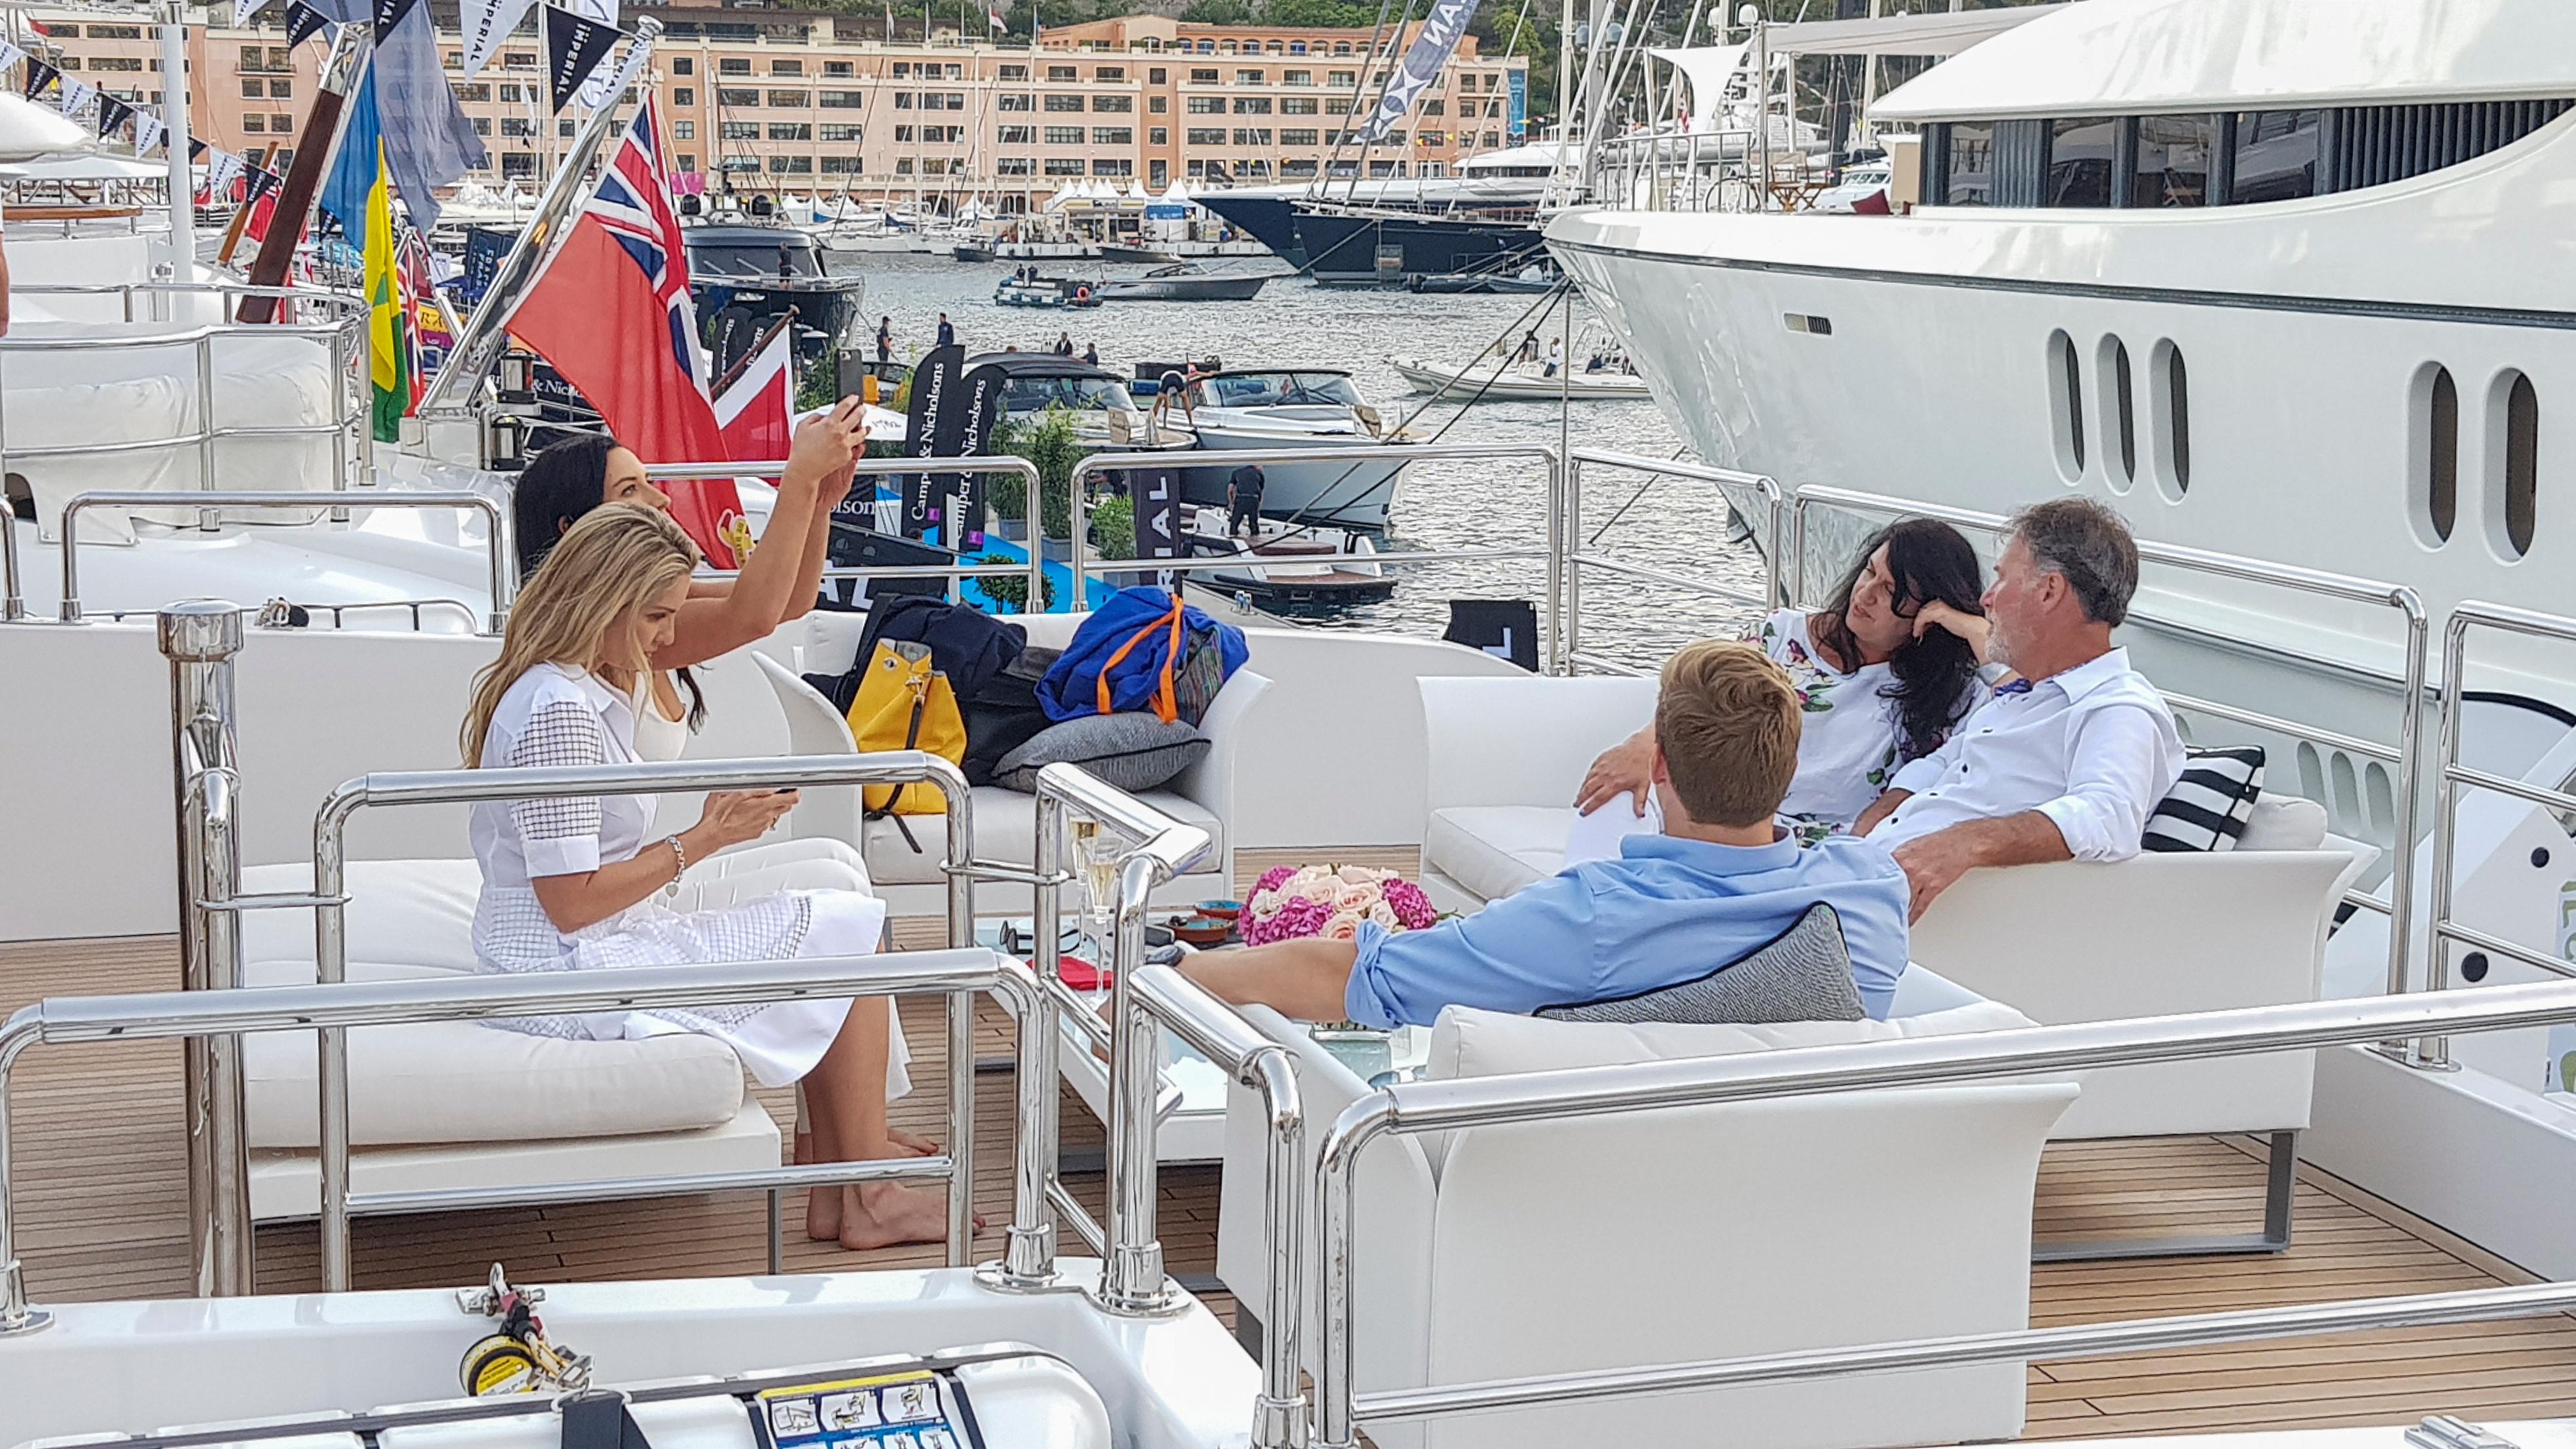 Gulf Craft at Monaco Yacht Show 2018 Day 1 (17).jpg